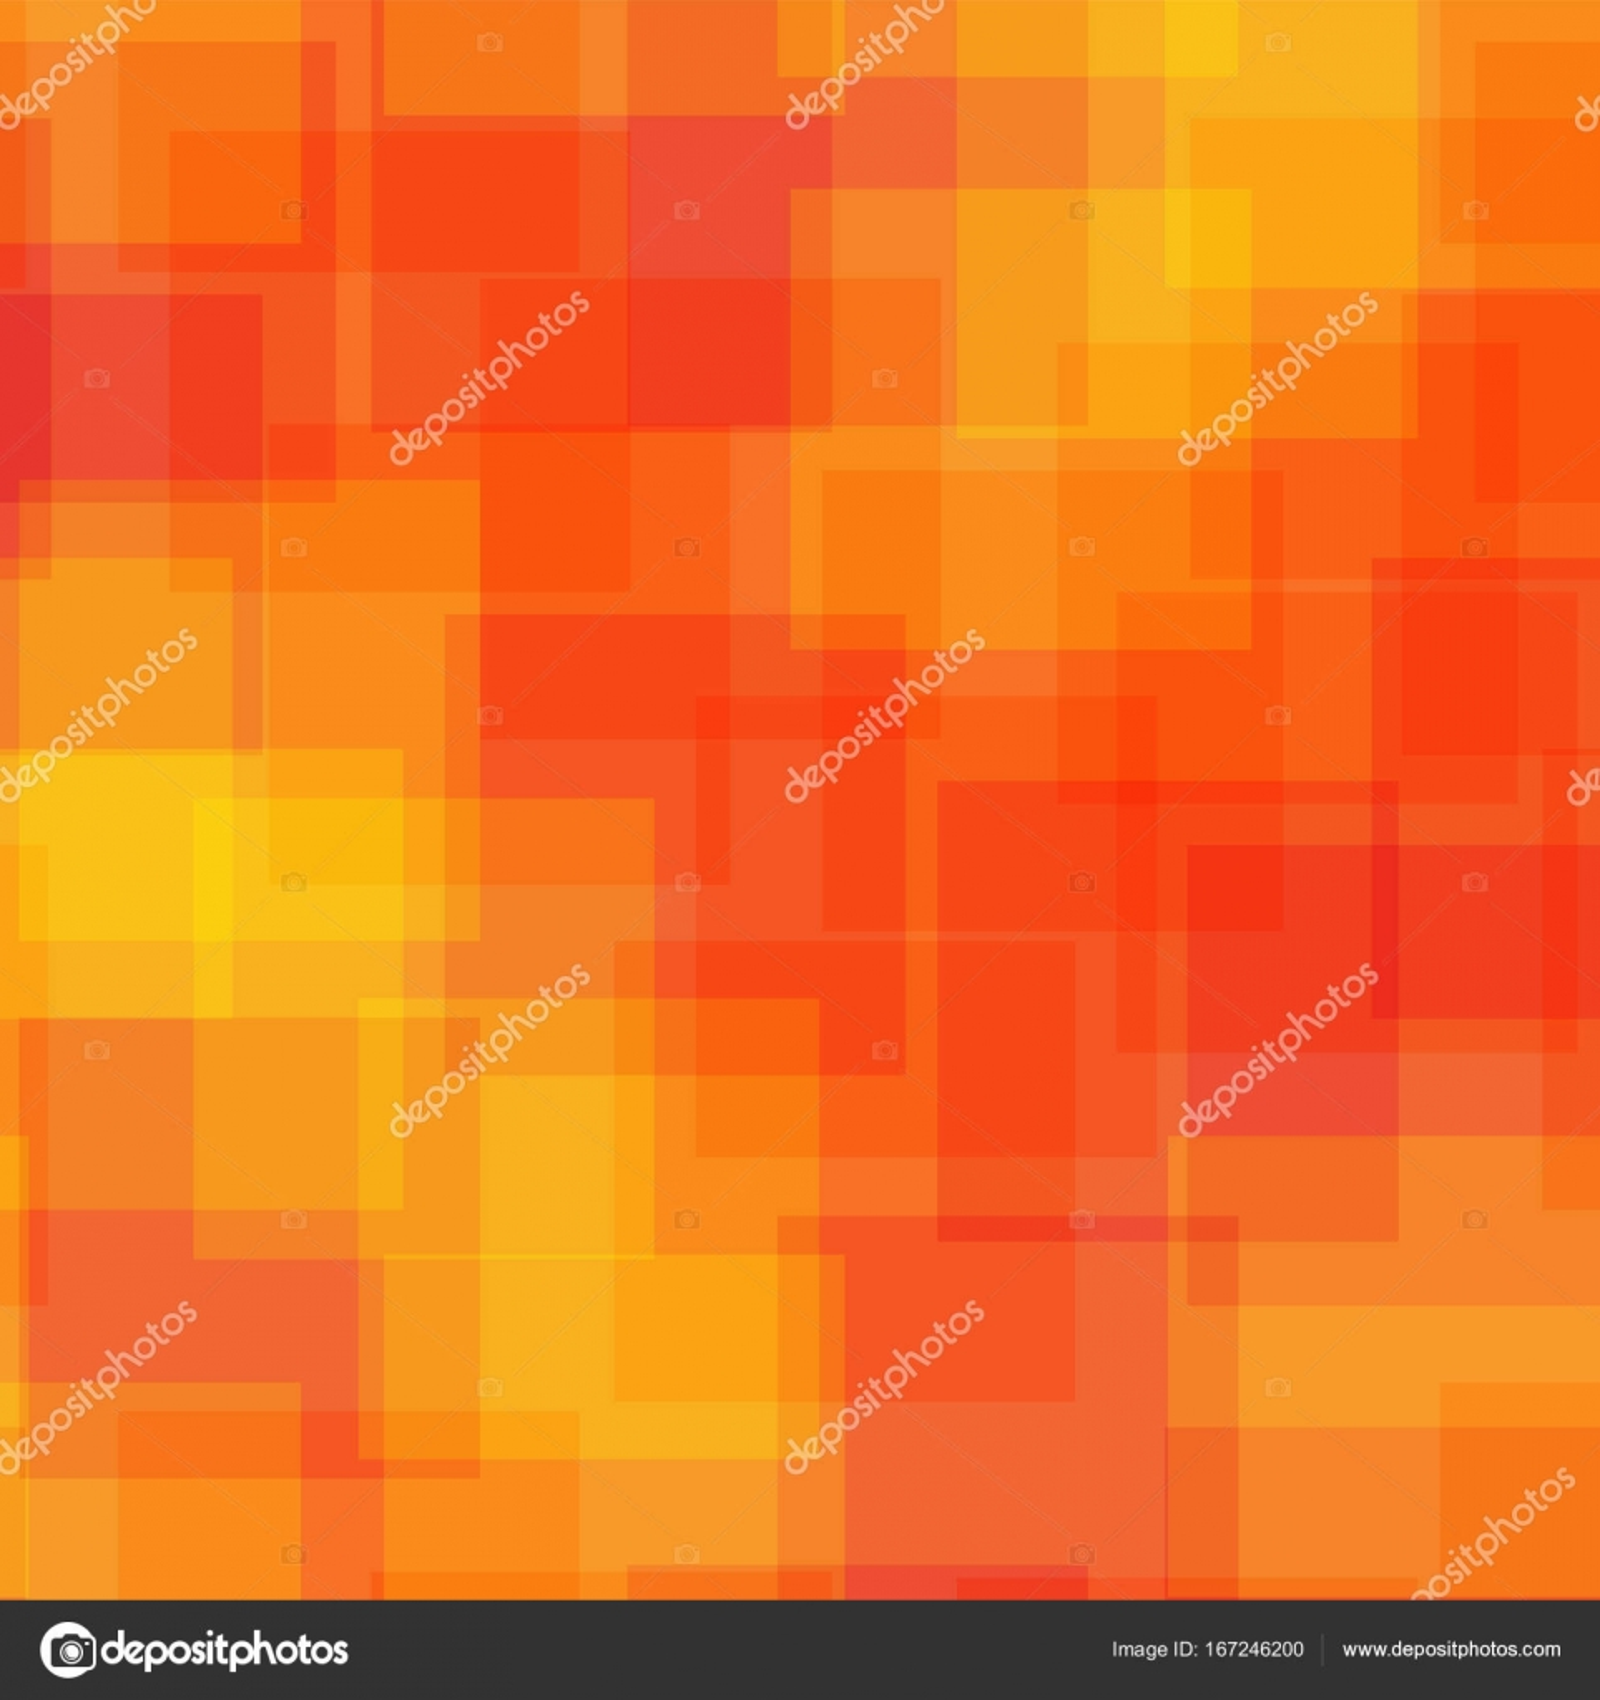 Resumen plazas patrón naranja fondo geométrico Ideal al azar plazas ...